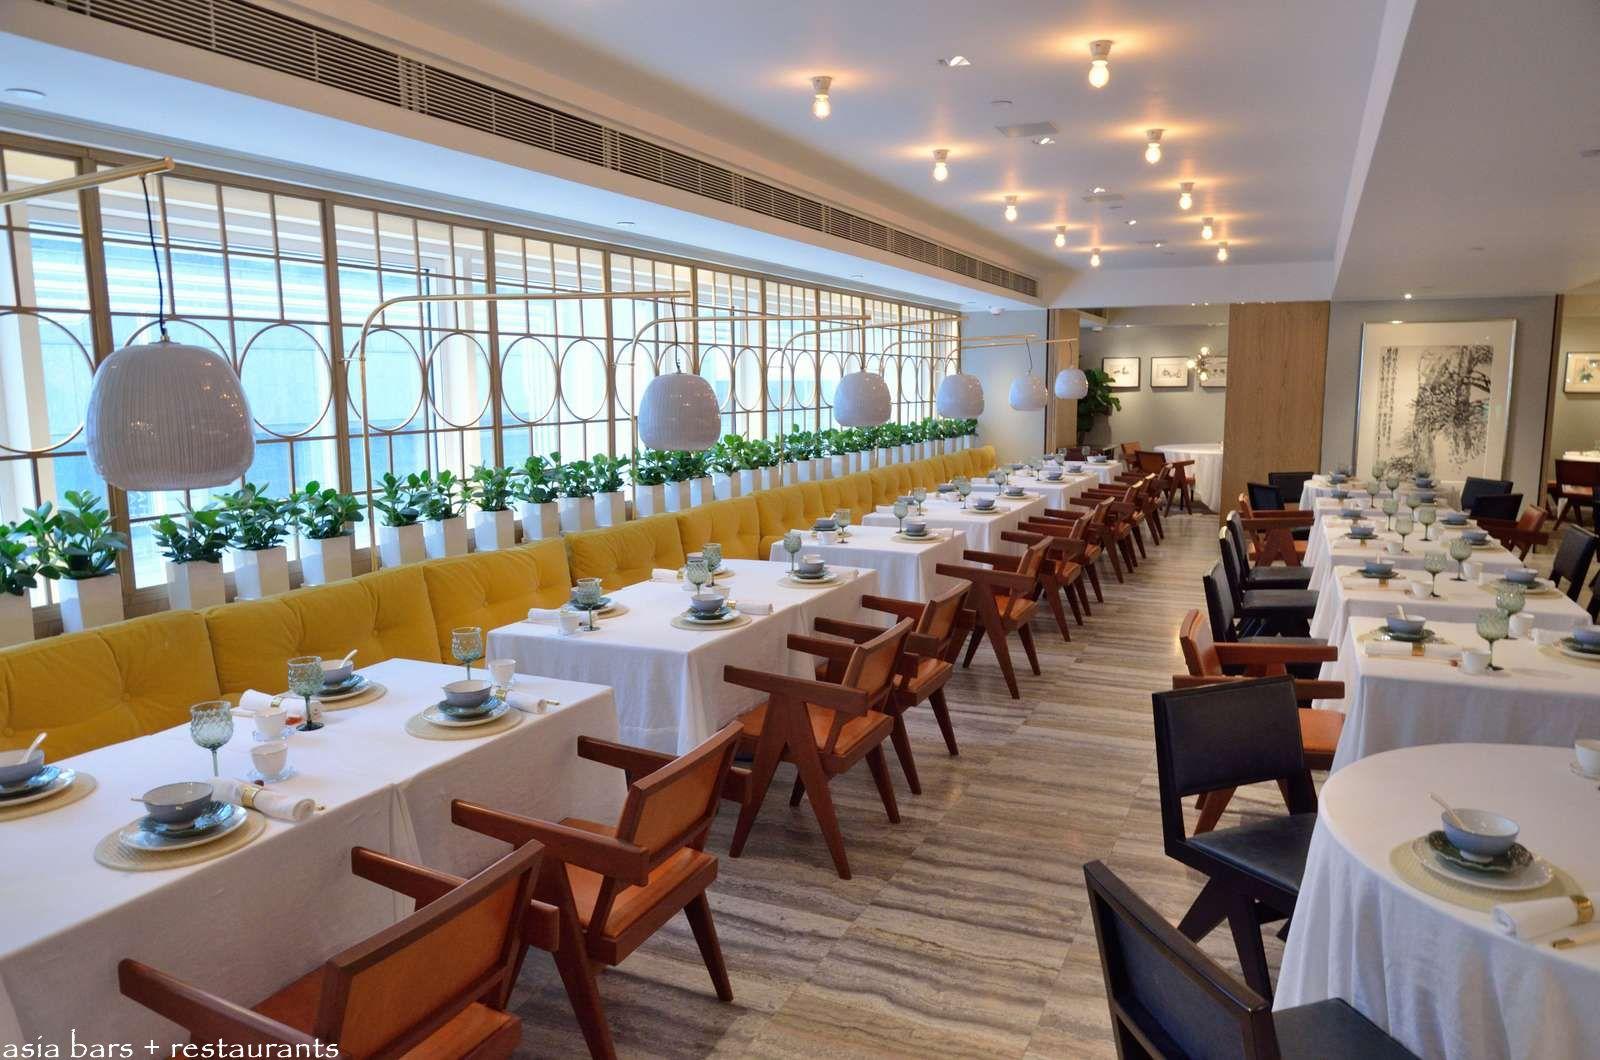 duddell s restaurant salon art space in hong kong asia bars restaurants. Black Bedroom Furniture Sets. Home Design Ideas